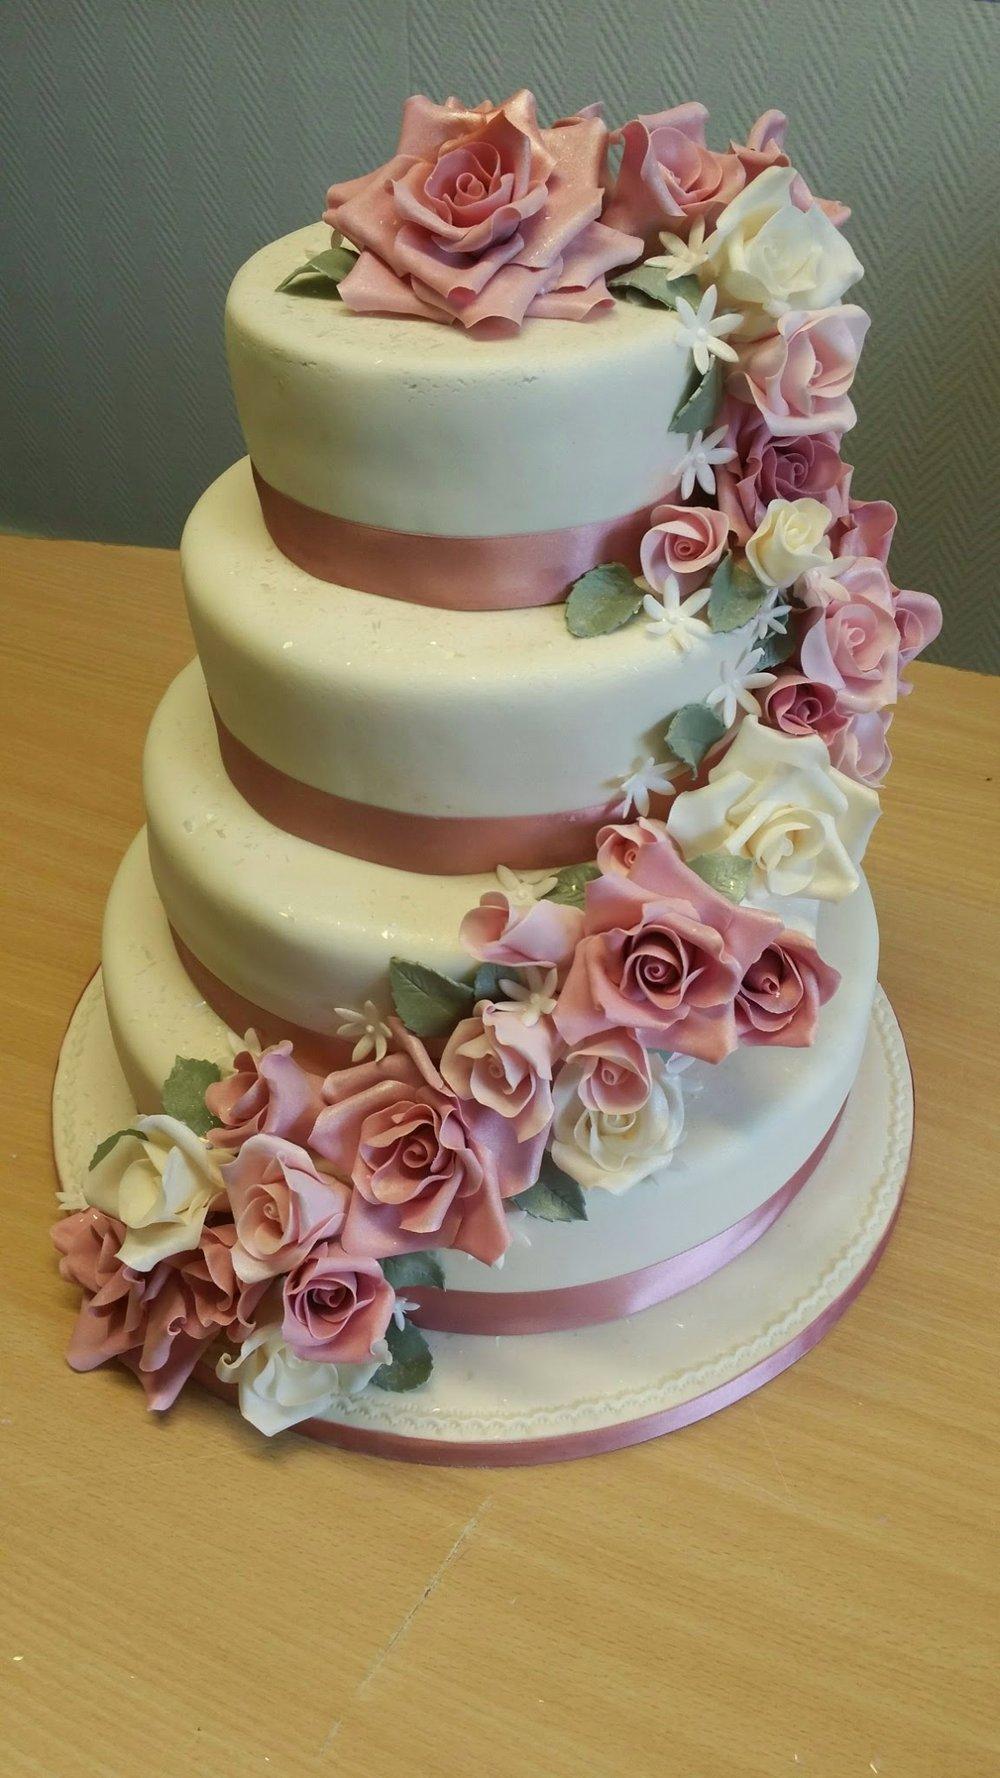 Surprising Flowers Cakes Cakeadelic Wedding Cakes And Birthday Cakes In Birthday Cards Printable Opercafe Filternl